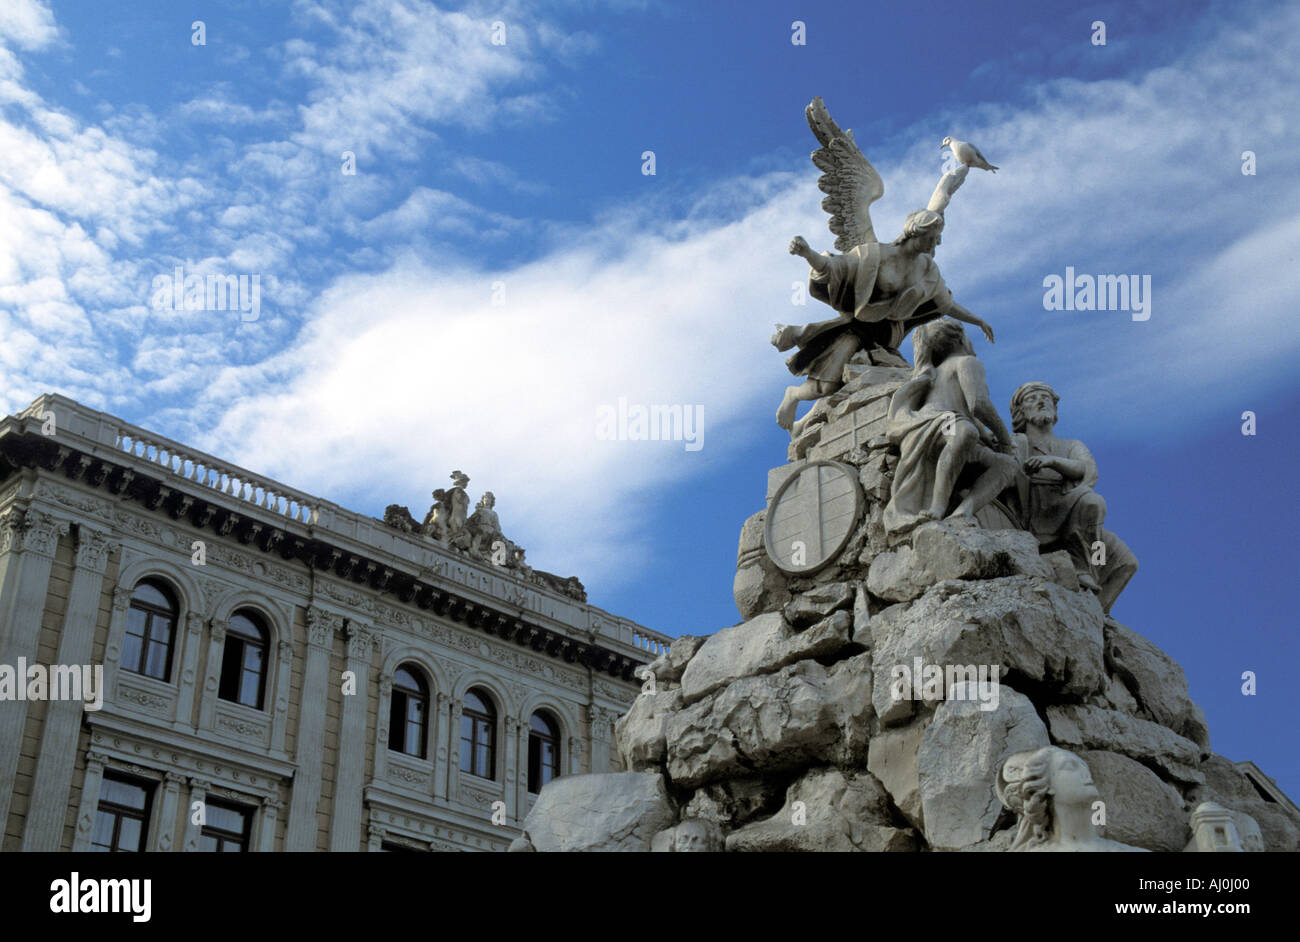 Vier Kontinent Brunnen Unit d Italia quadratische Friaul-Julisch Venetien-Italien Stockbild